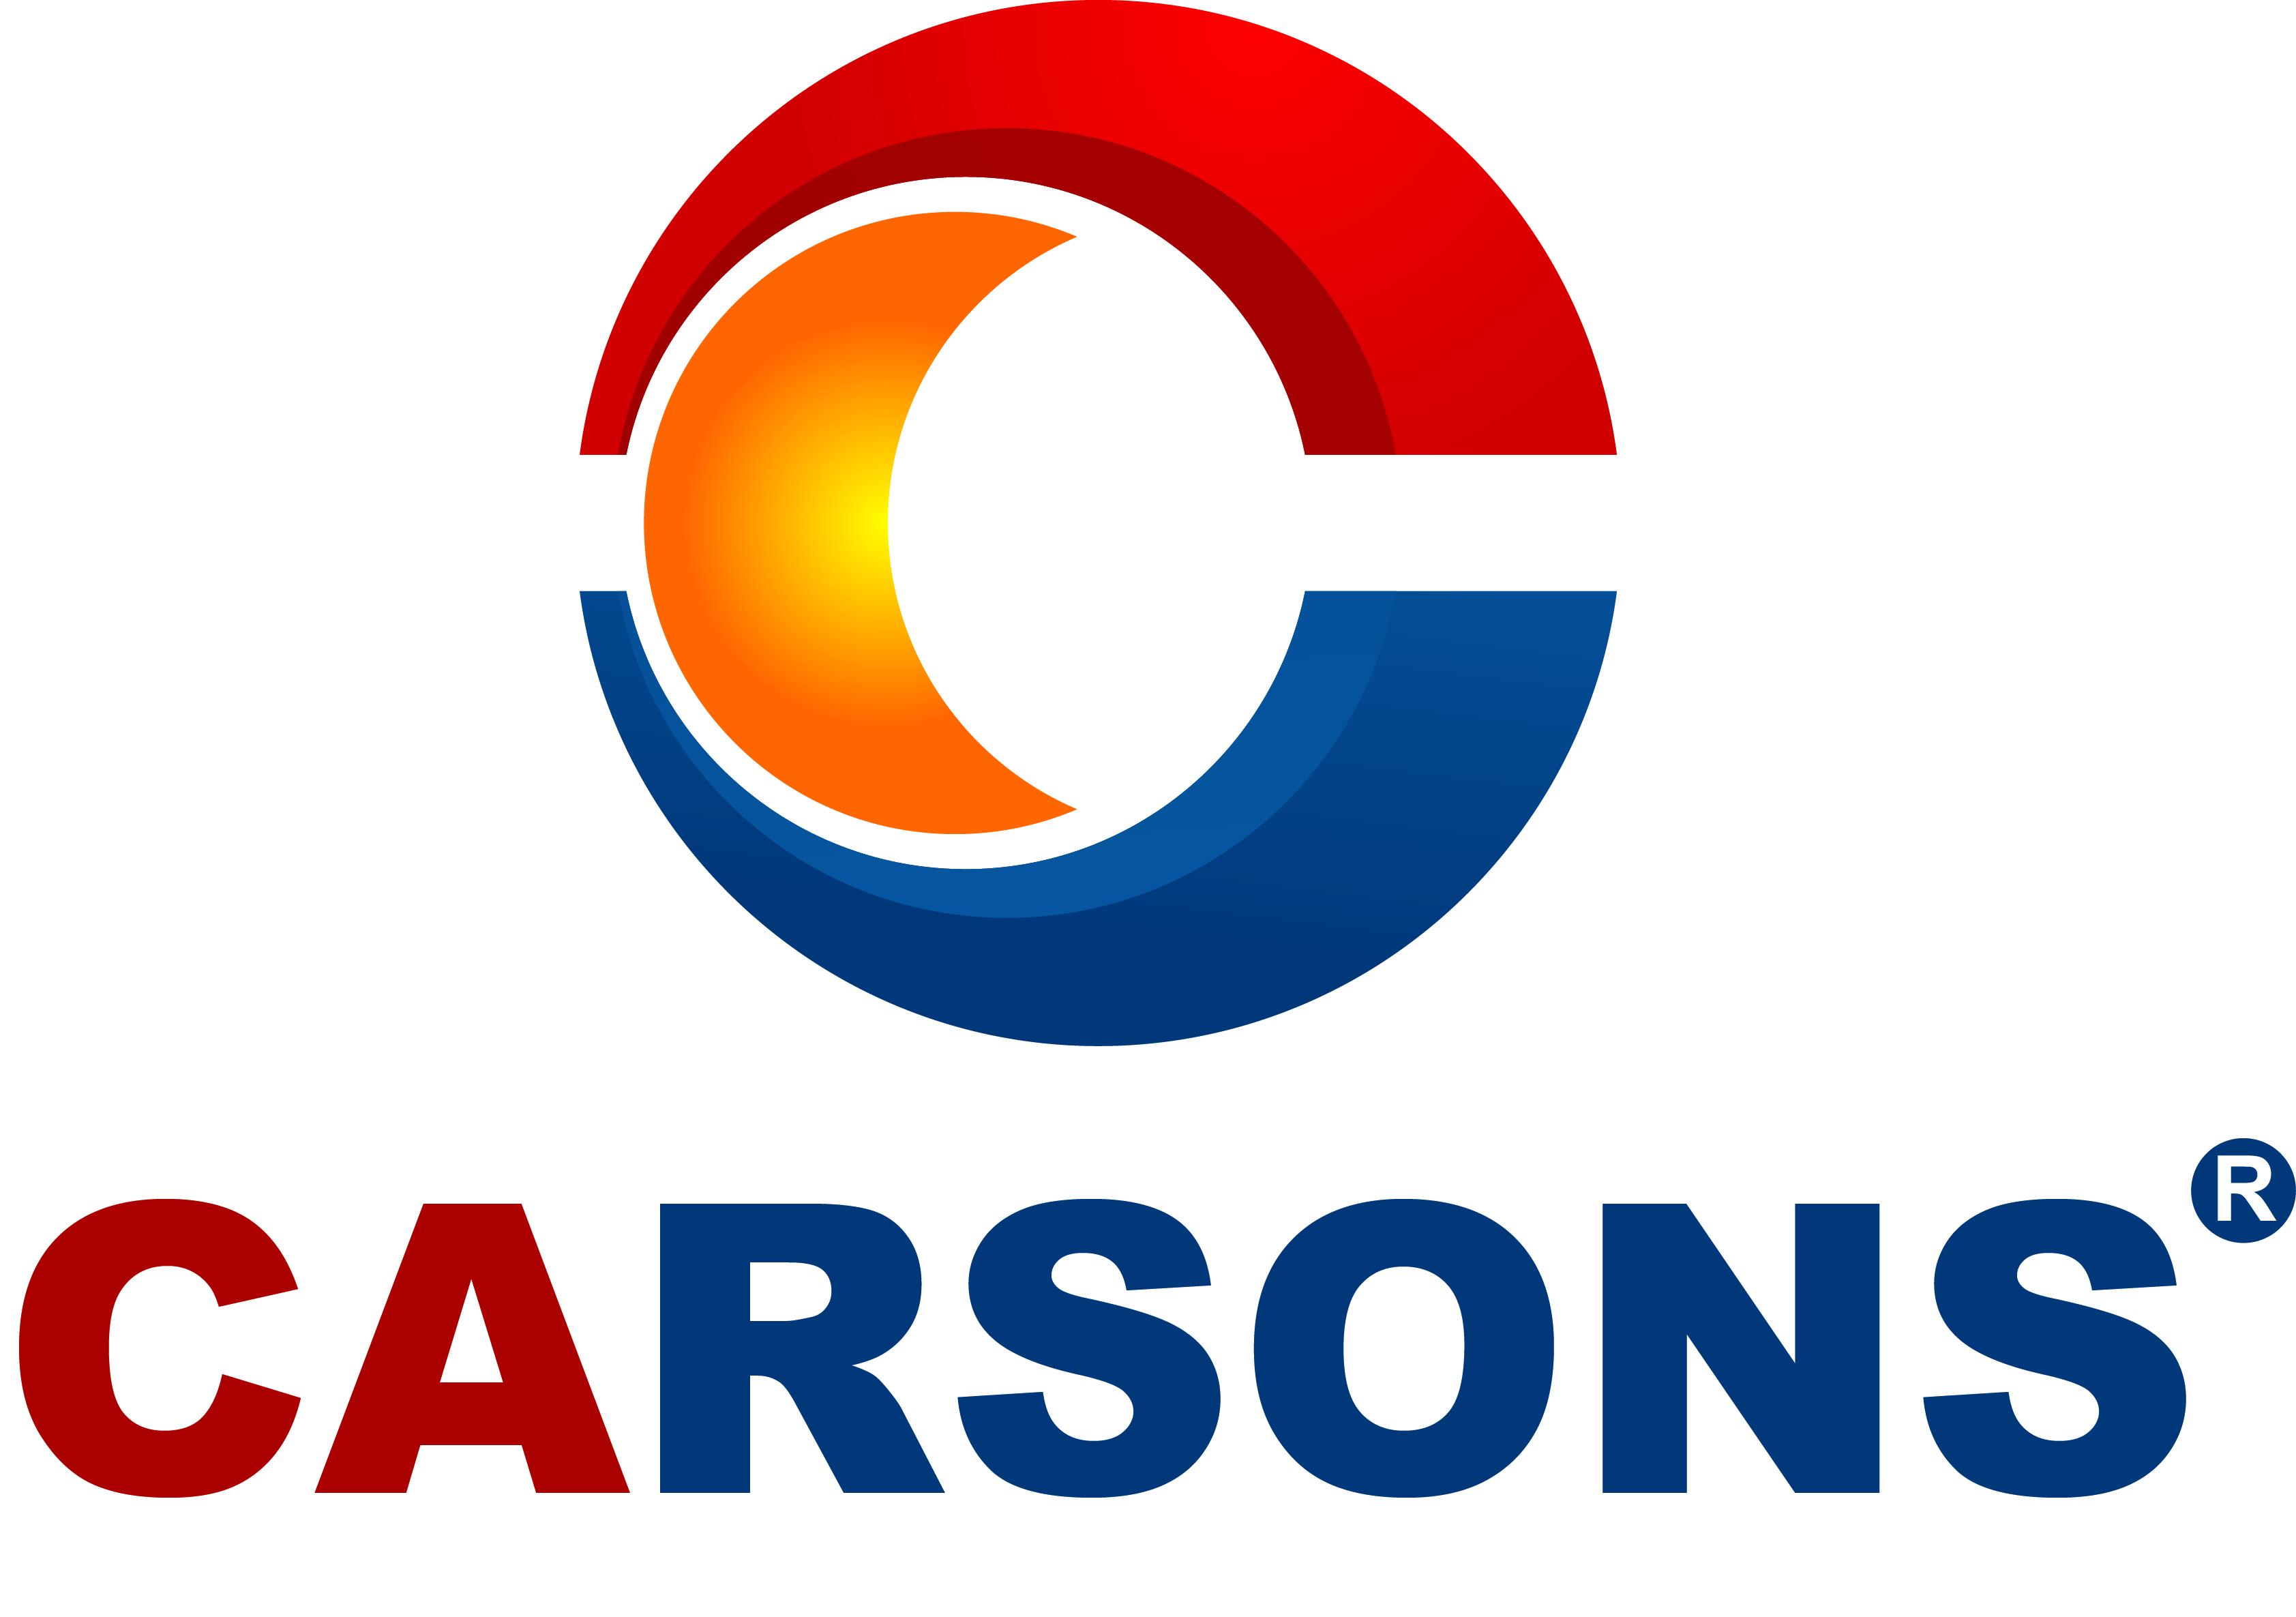 Carsons Ent  Ltd  - TradeMalta : TradeMalta